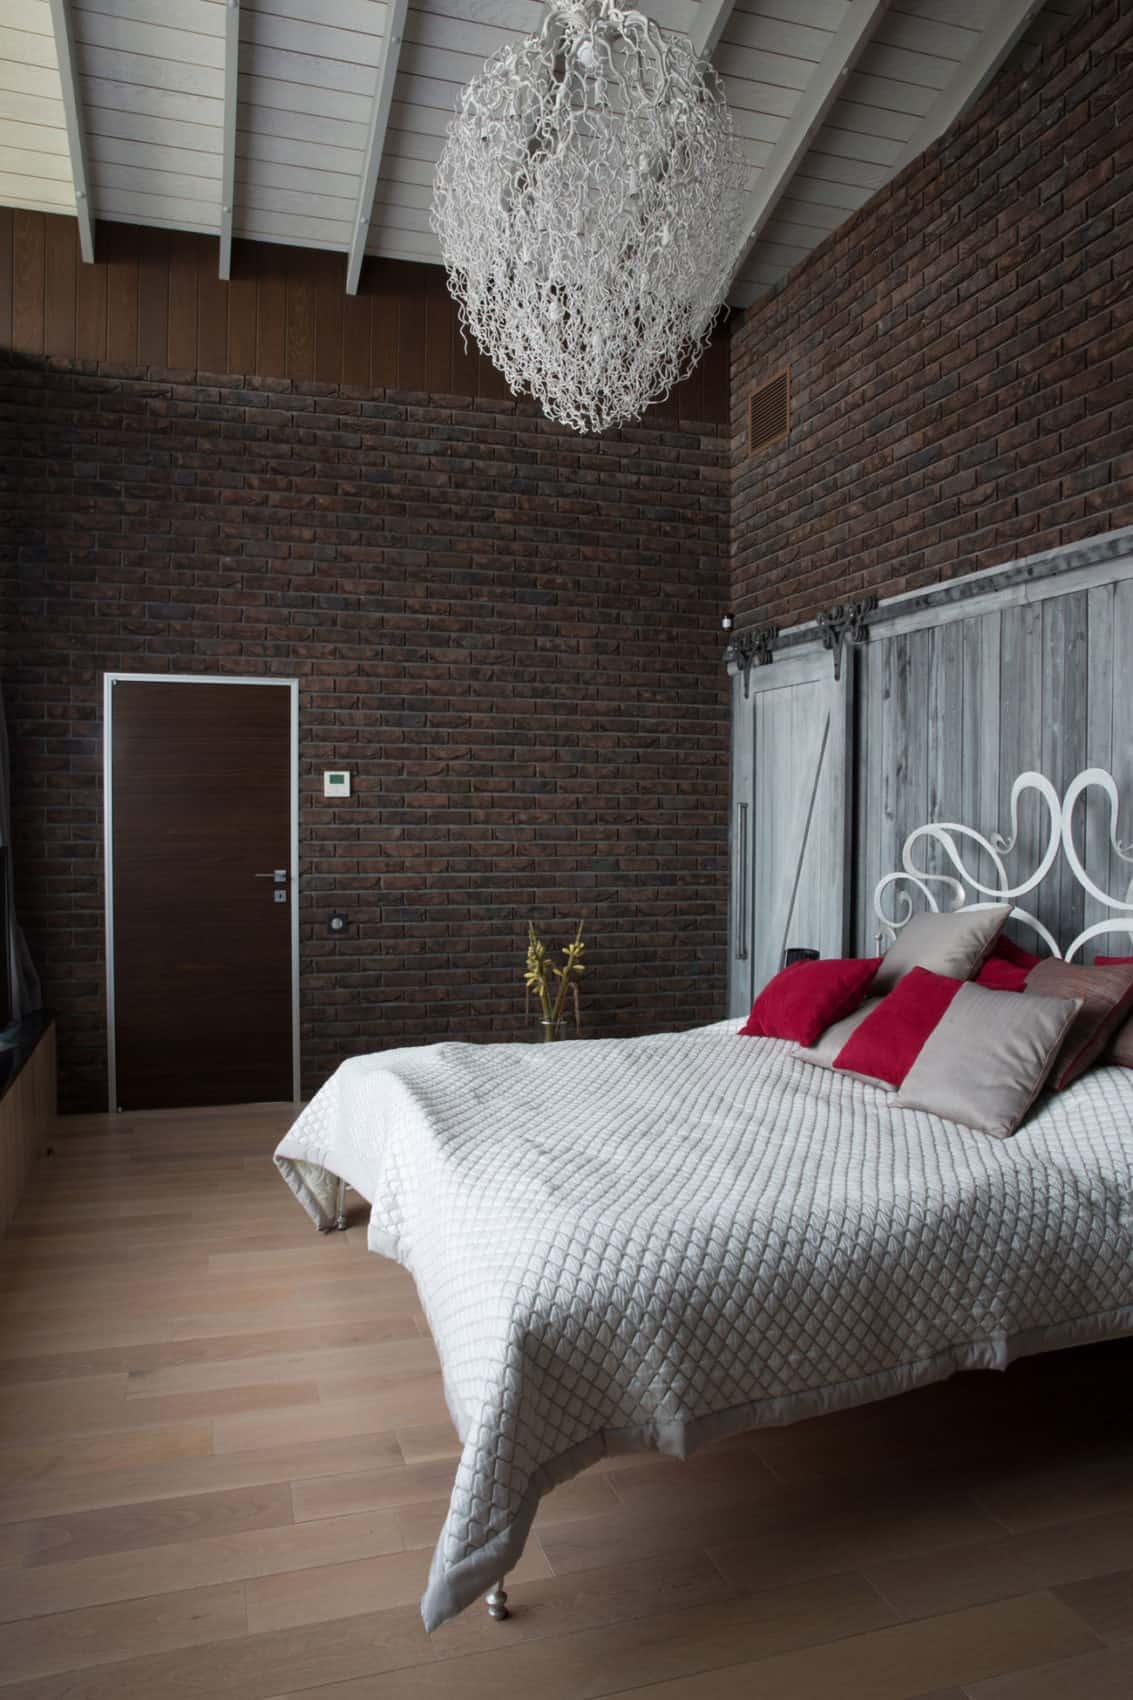 Elite House by Architectural Studio Chado (12)